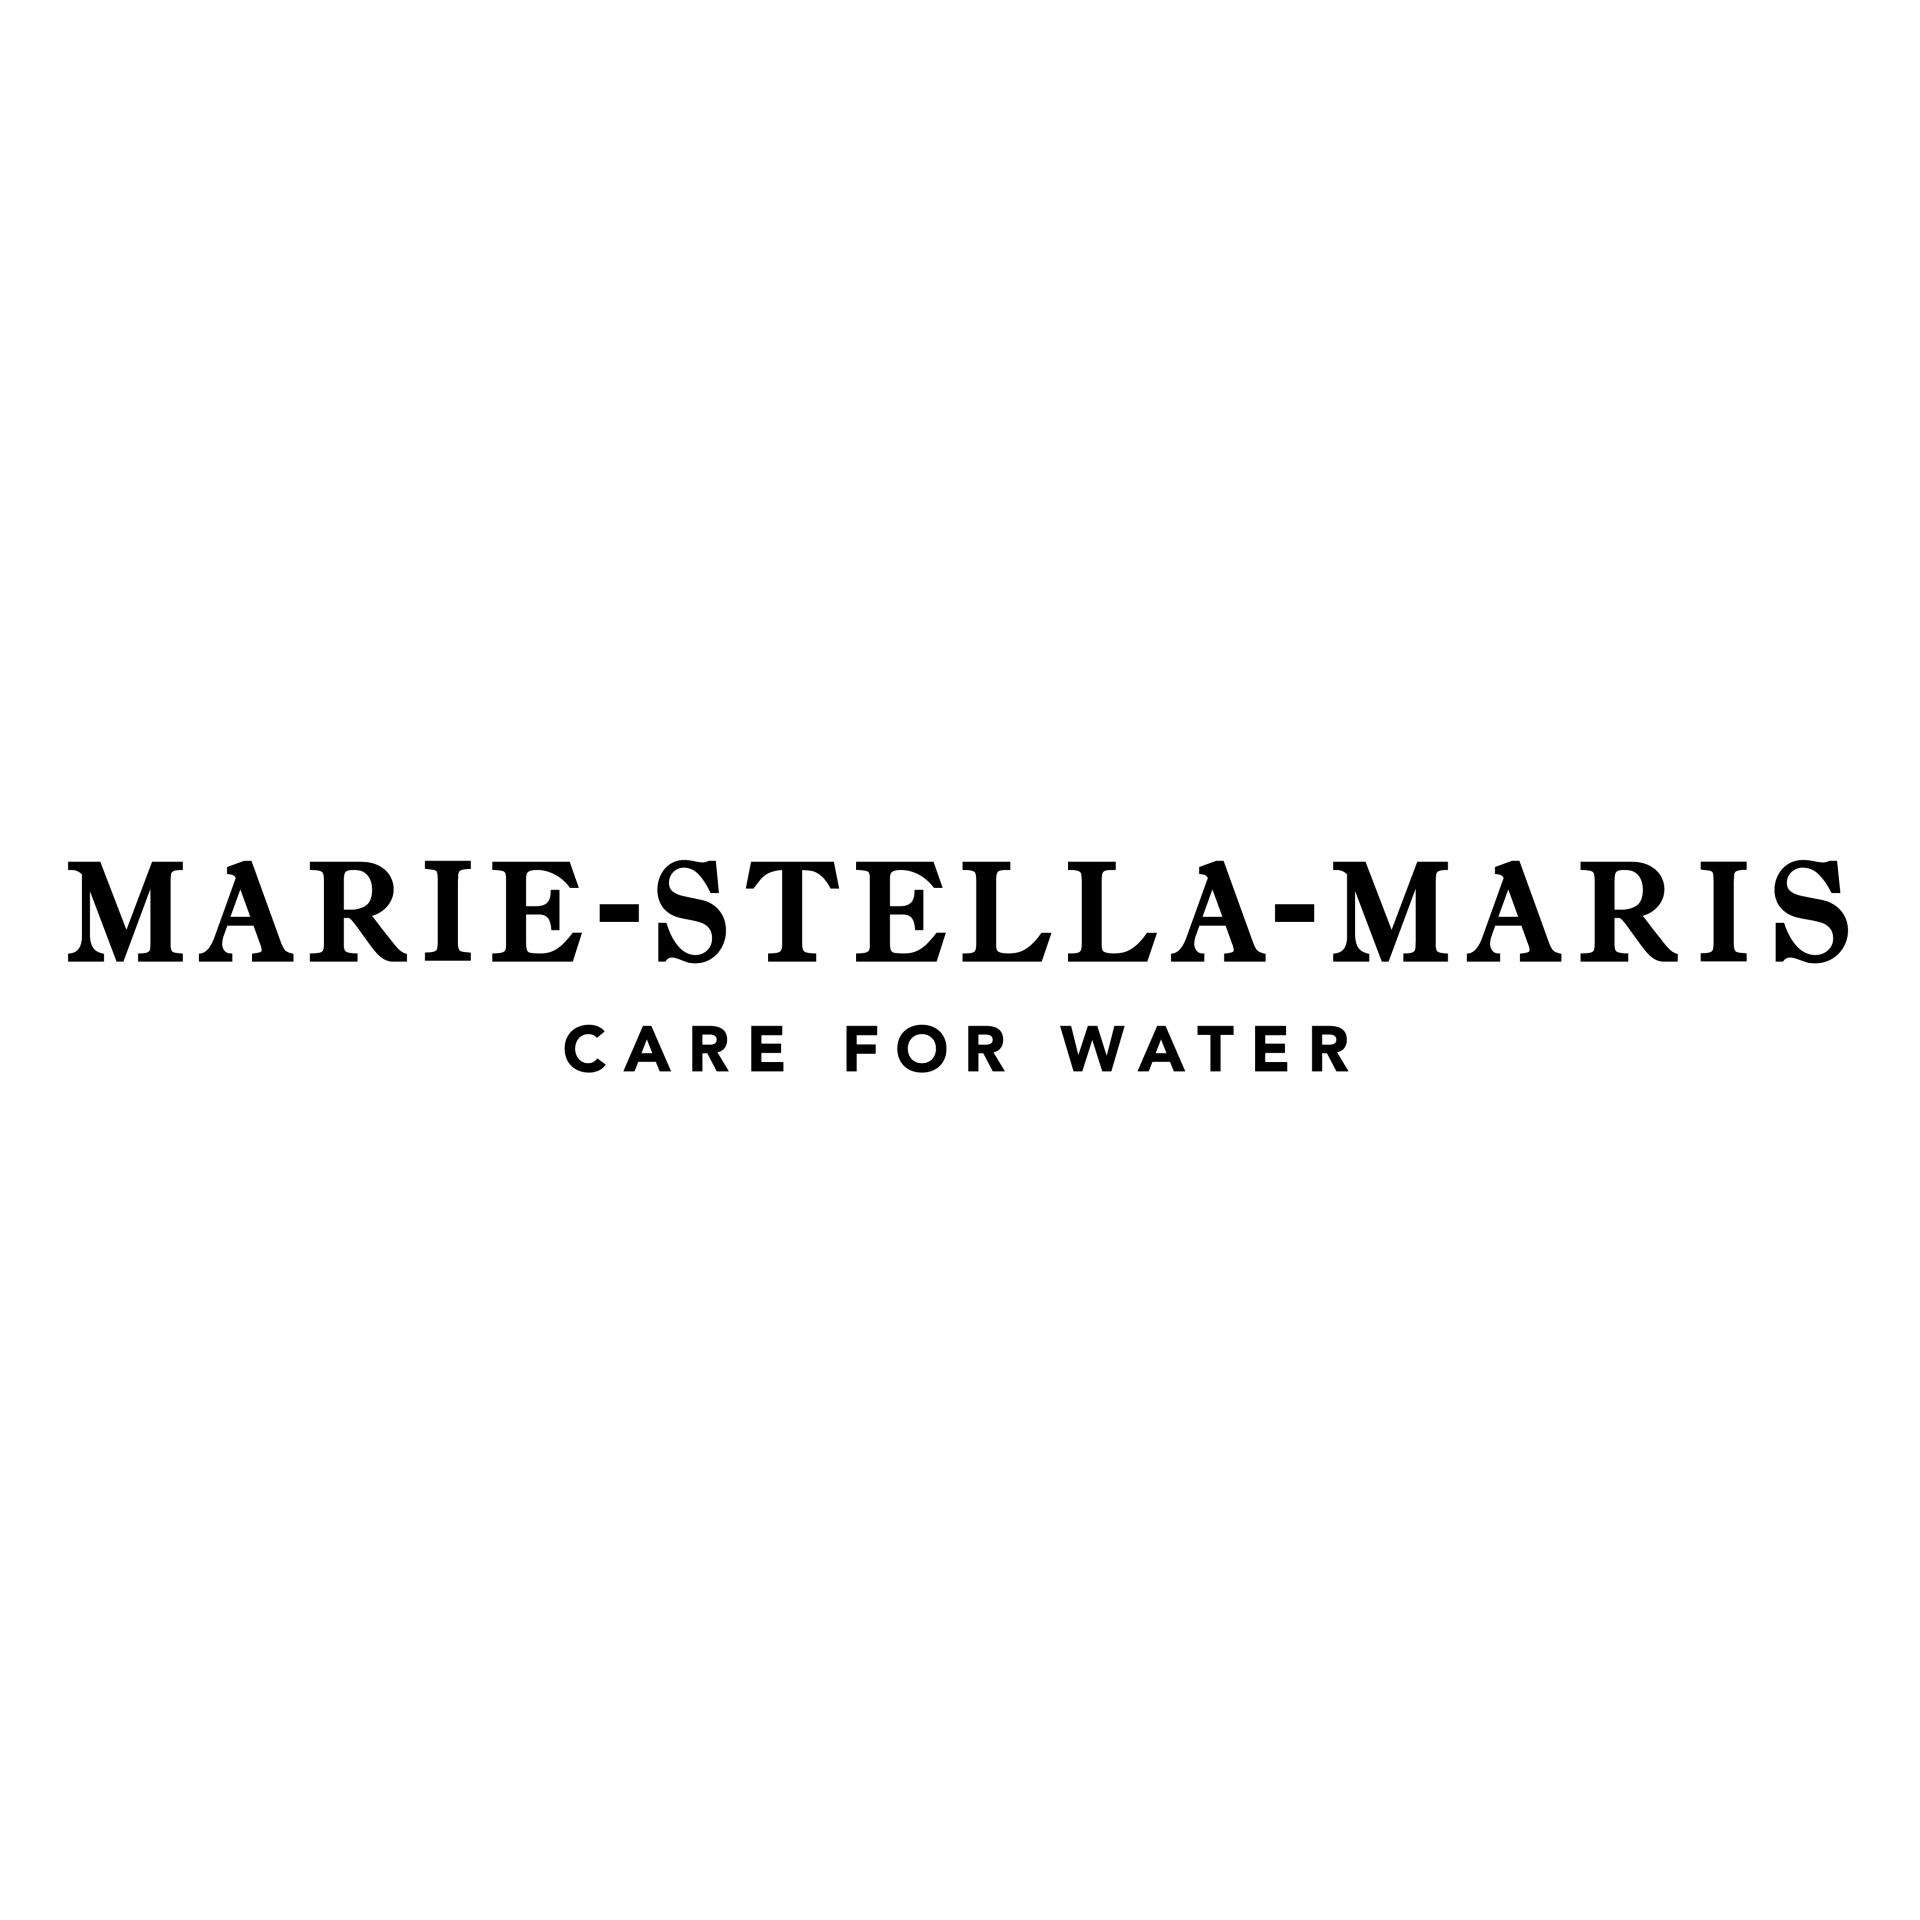 nectar-utrecht-frisdrank-water-producent-nederland-streekproduct-amsterdam-marie-stella-maris-logo-01